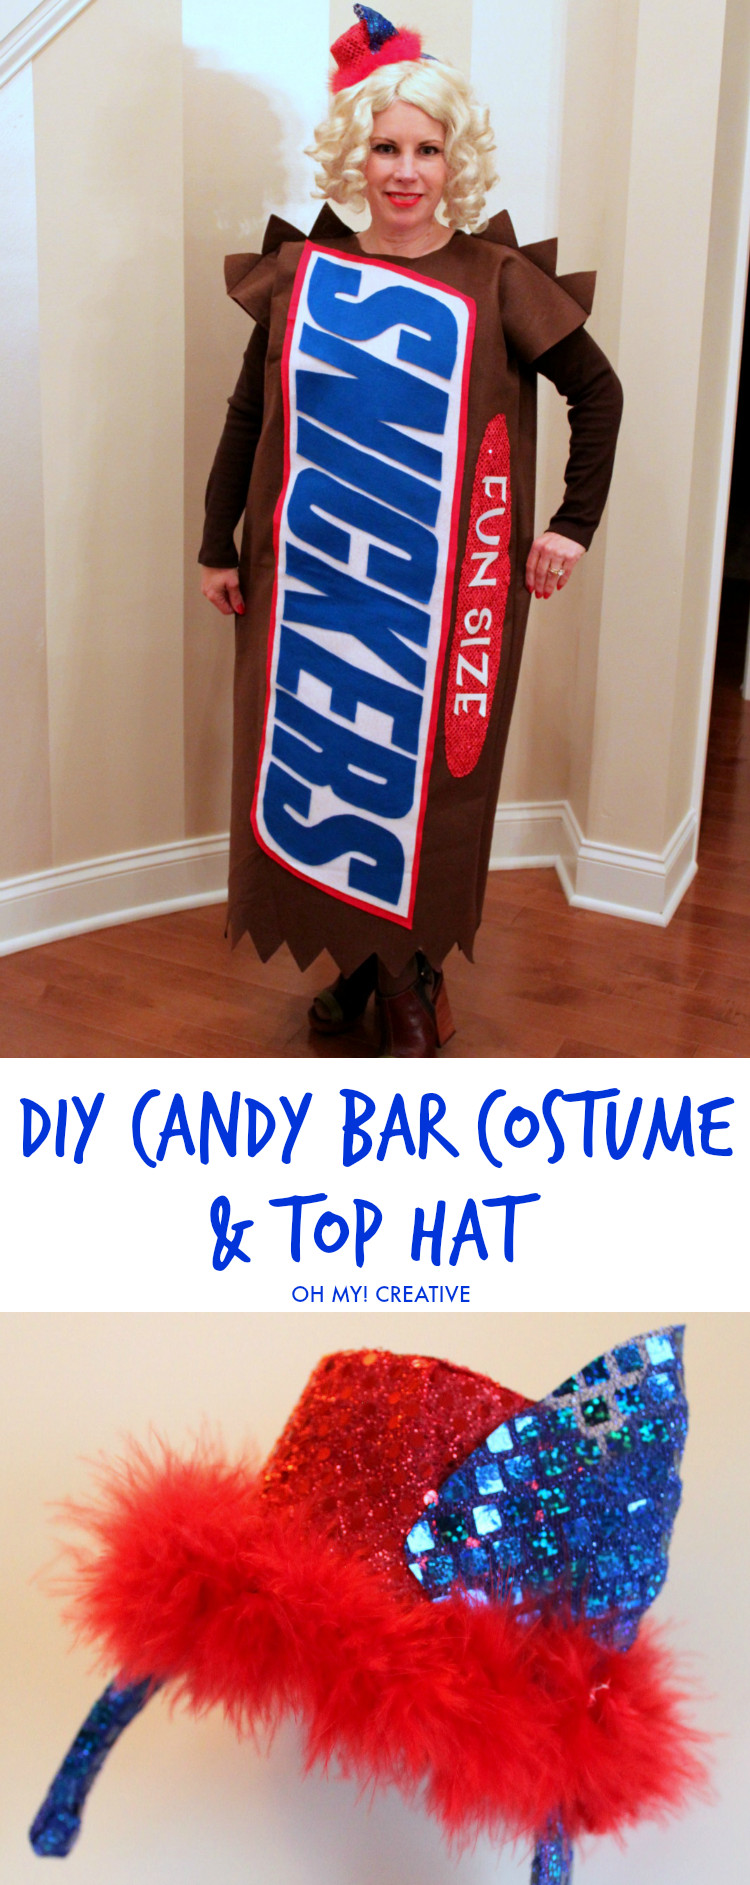 Creative DIY Halloween Costumes For Adults  DIY Candy Bar Halloween Costumes Oh My Creative